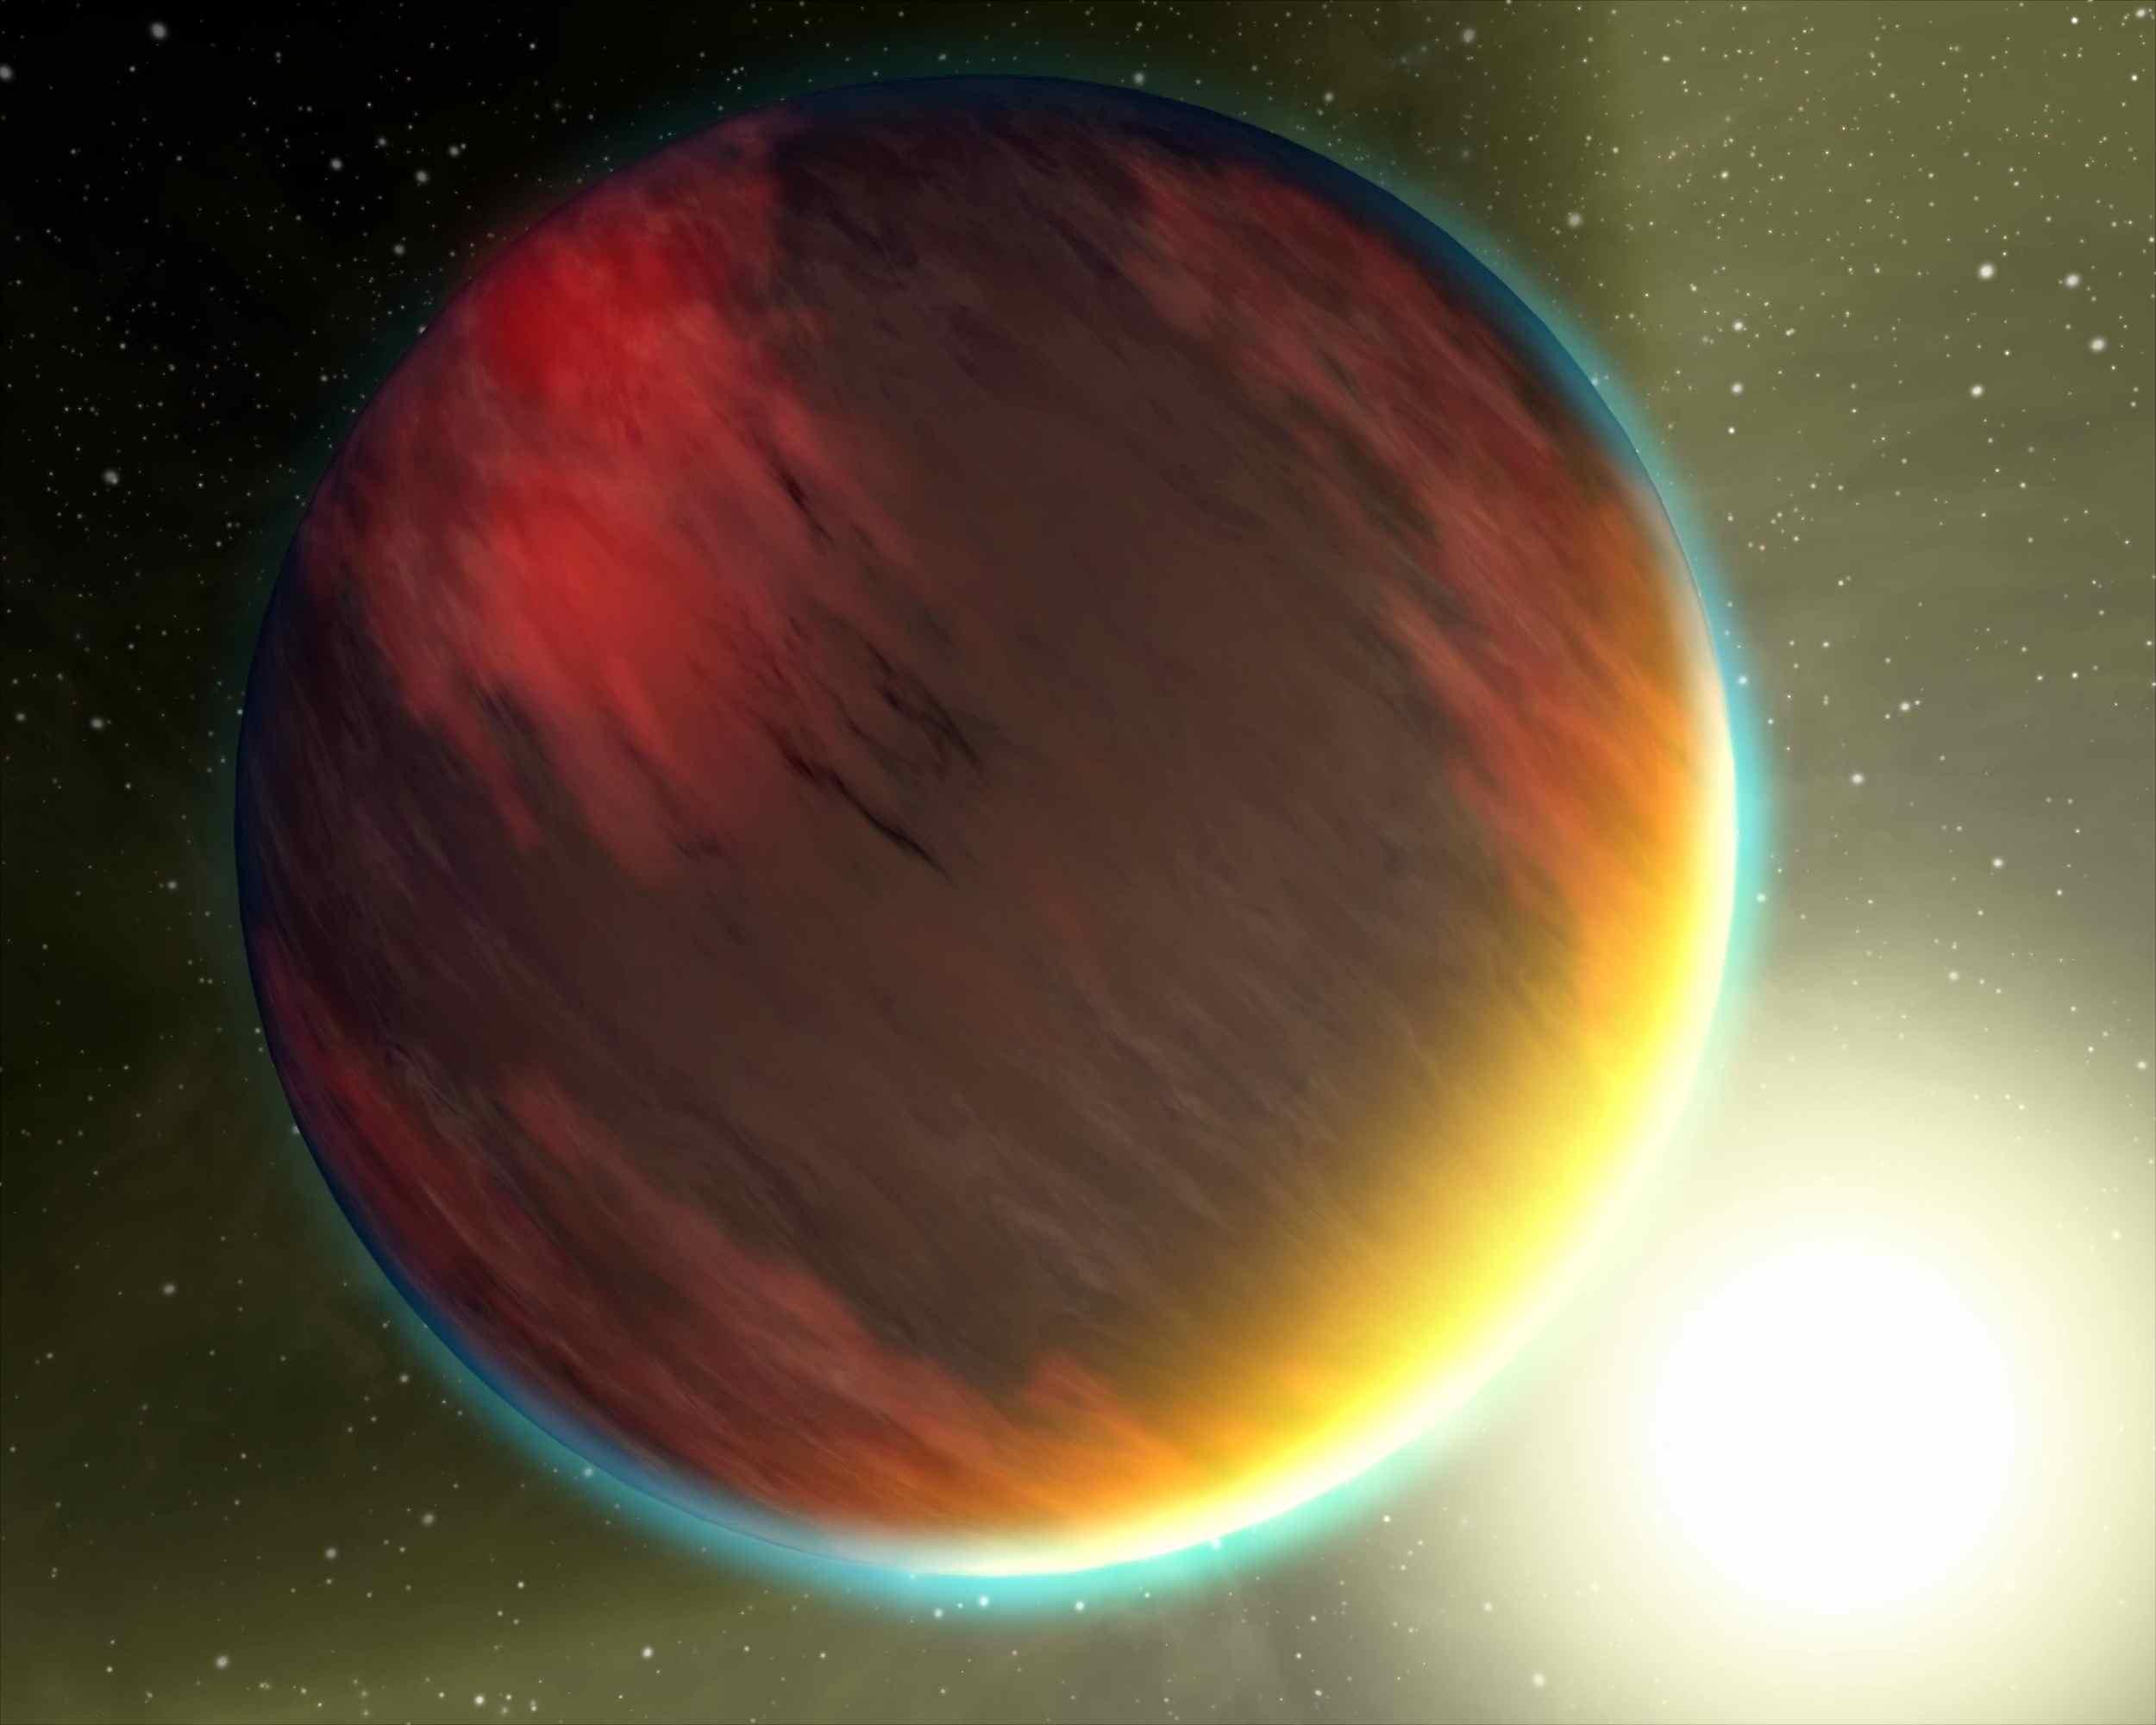 Exotic Atmospheres (Artist Concept) (Image Credit: NASA/JPL-Caltech)